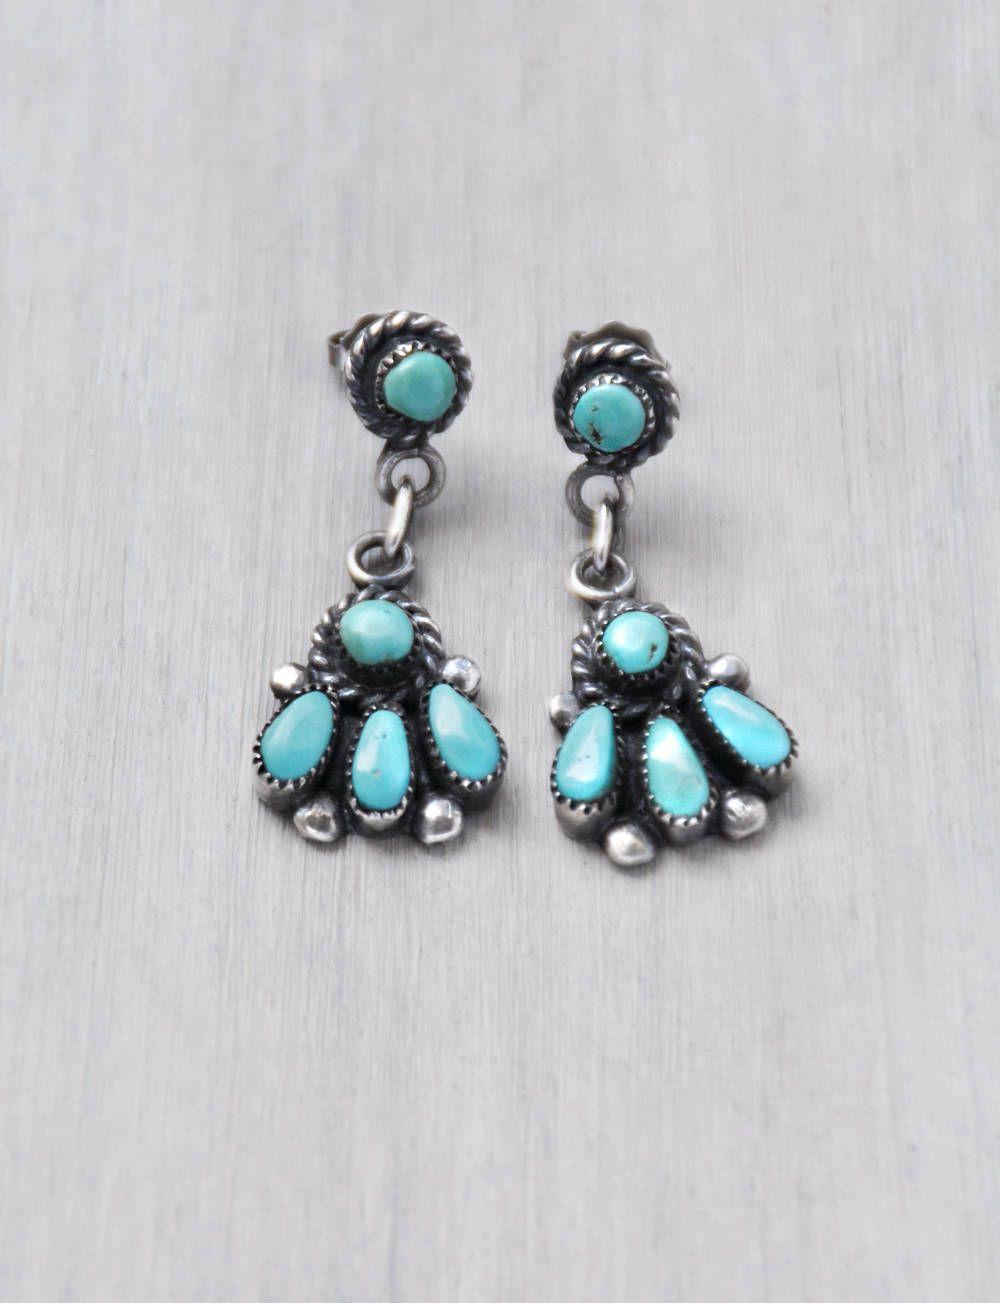 Vintage Pe Point Turquoise Earrings By Bill Lou Laweka Native American Zuni Dangle